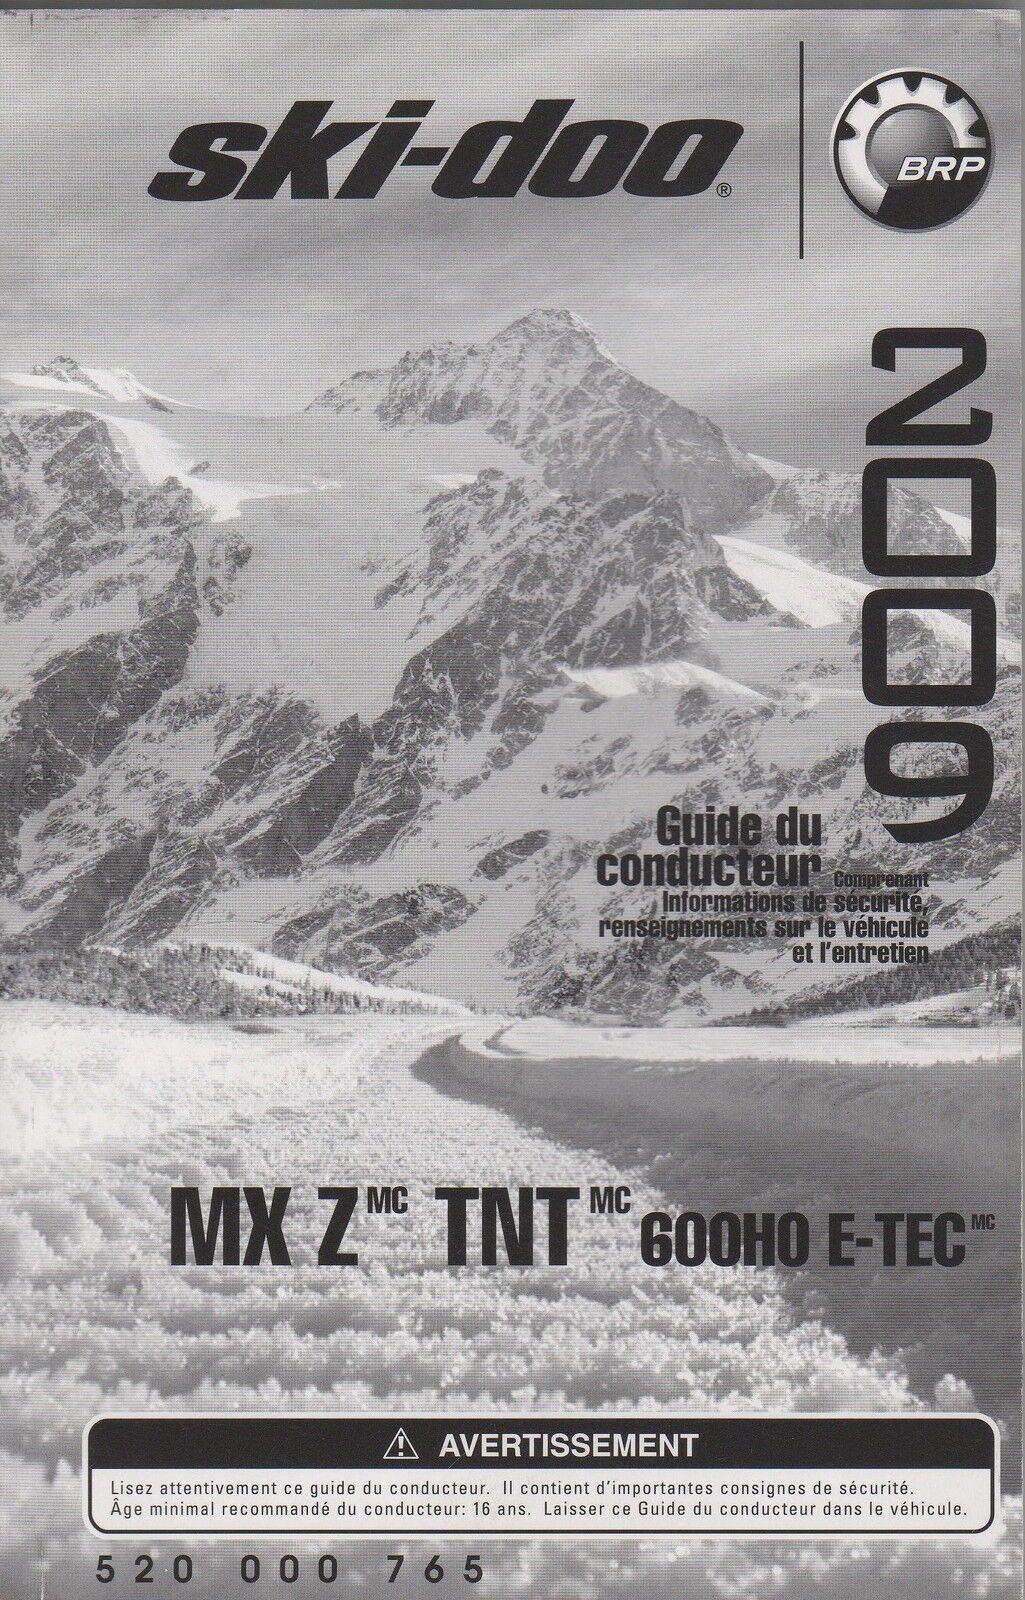 2009 SKI-DOO SNOWMOBILE MX Z, TNT 600HO E-TEC (FRENCH) OPERATORS MANUAL